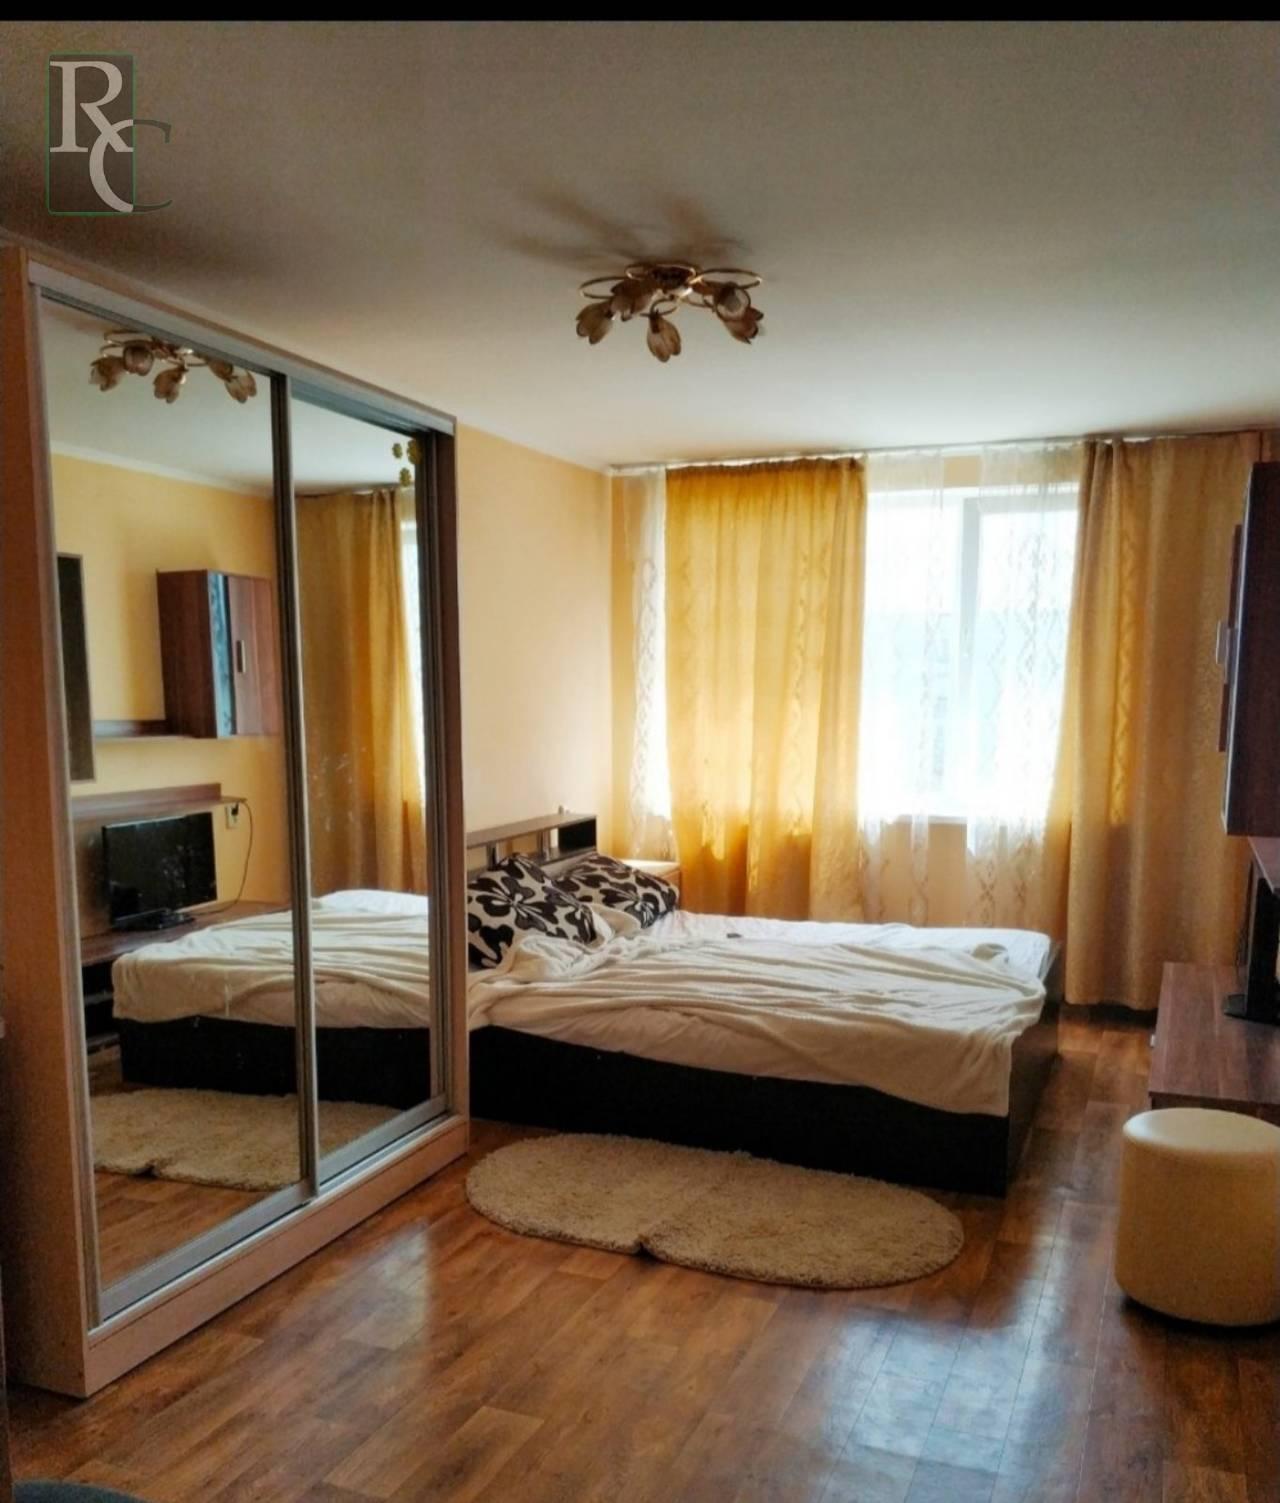 Продается двухкомнатная квартира на ул. А. Юмашева,26!